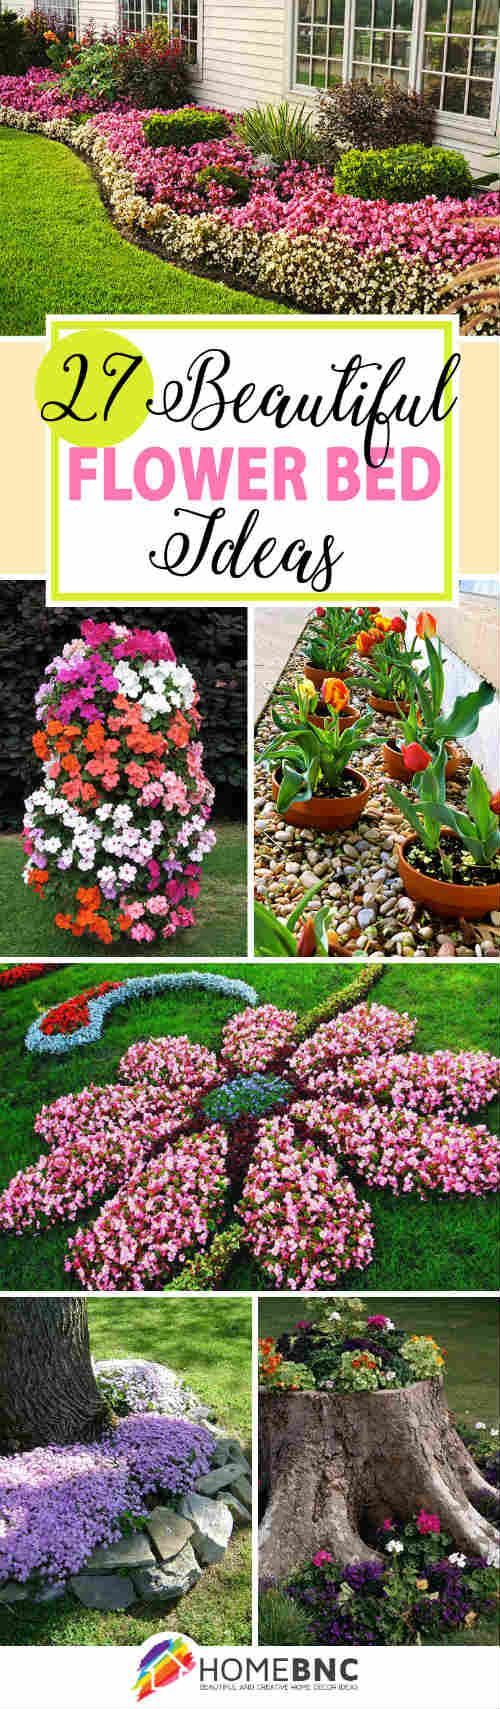 25 best ideas about flower beds on pinterest front flower beds front landscaping ideas and - Beautiful flower bed ideas ...